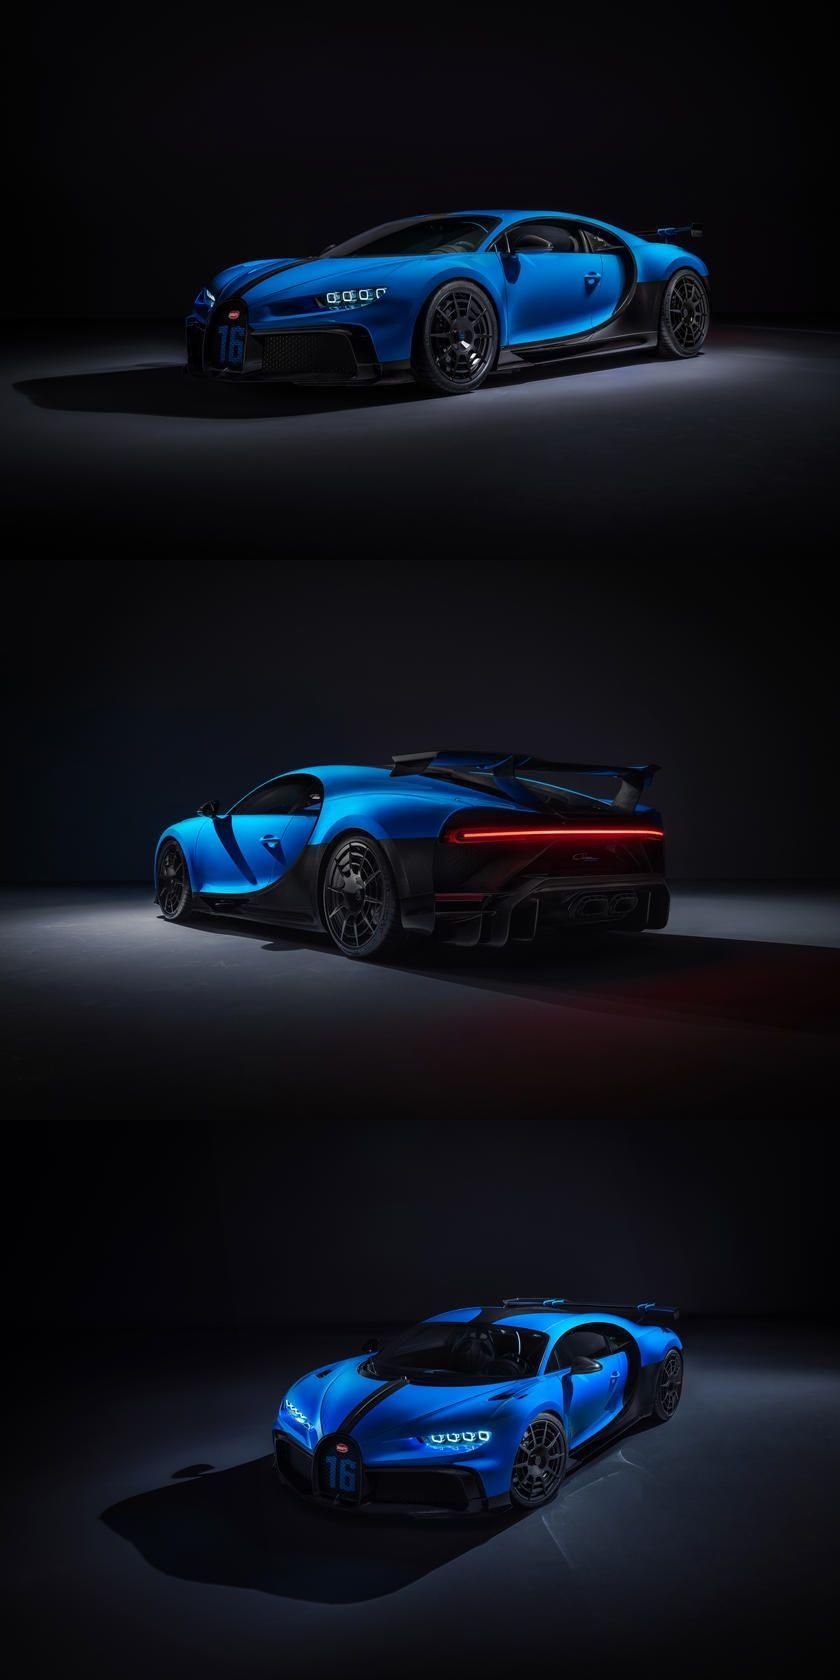 Bugatti Chiron Pur Sport Is A 1500 Hp Track Weapon Production Will Be Limited To Just 60 Units Each Costing An E In 2020 Super Car Bugatti Bugatti Chiron Bugatti Cars